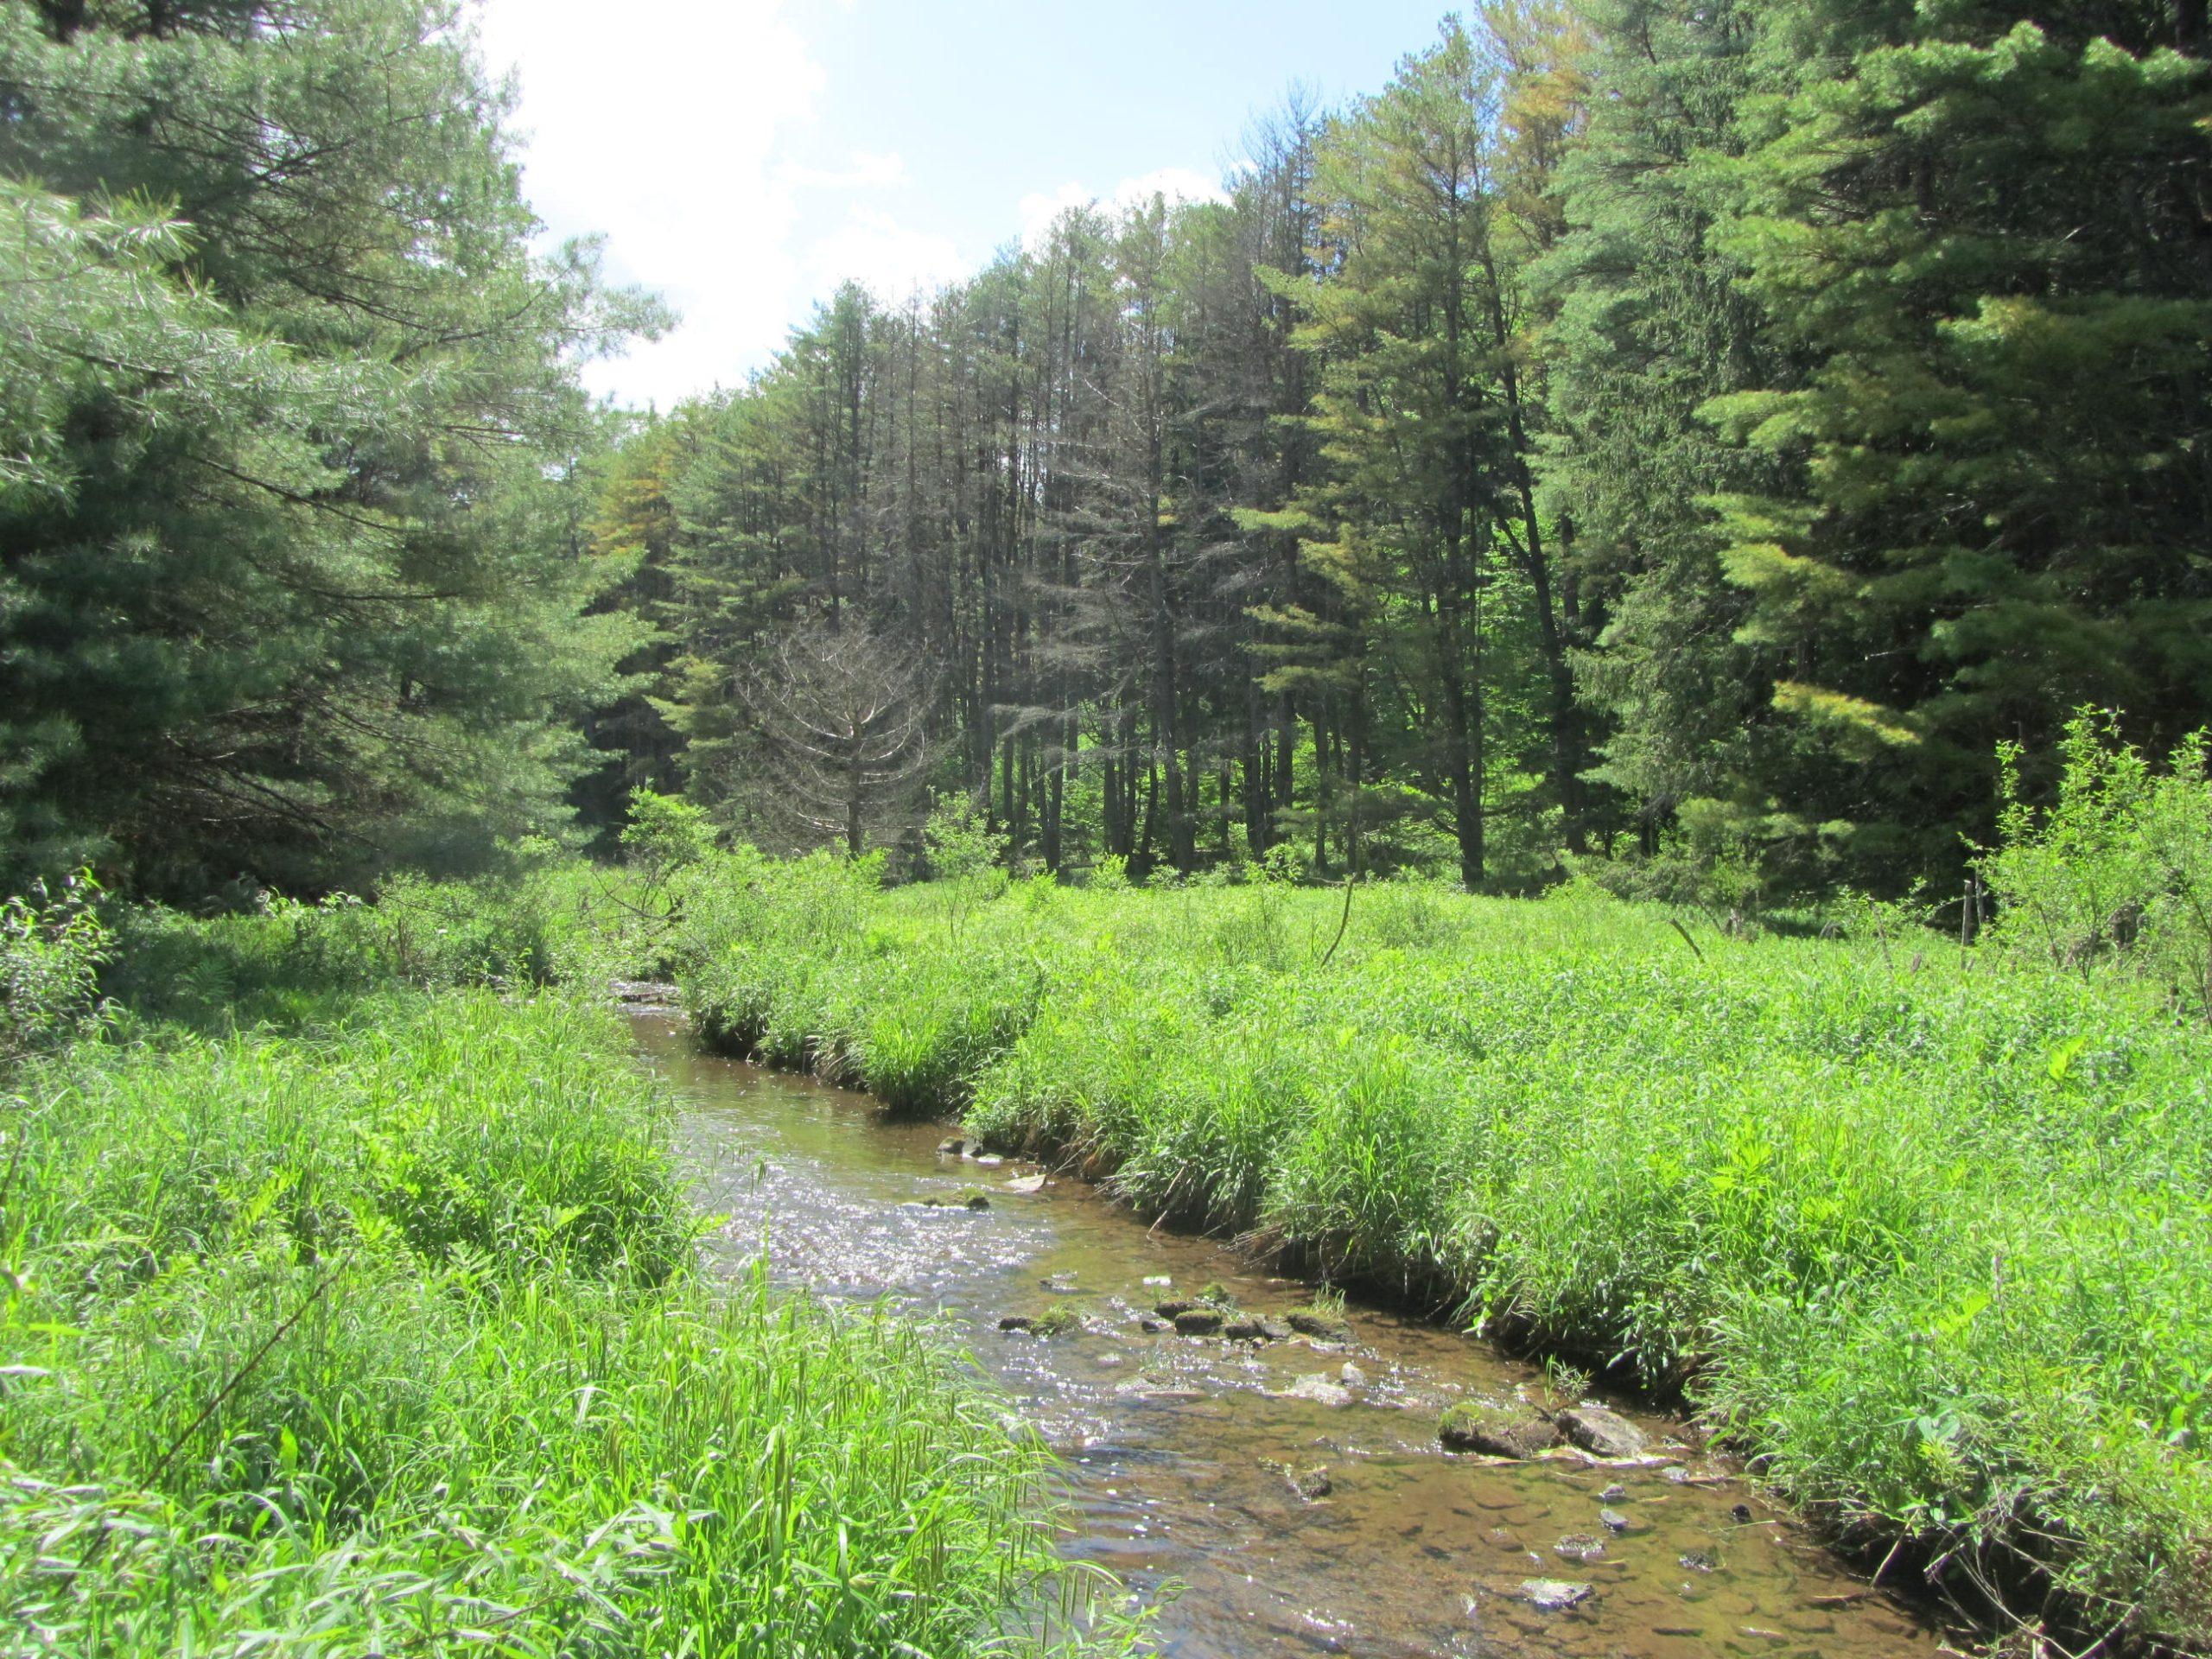 susquehannock trail system